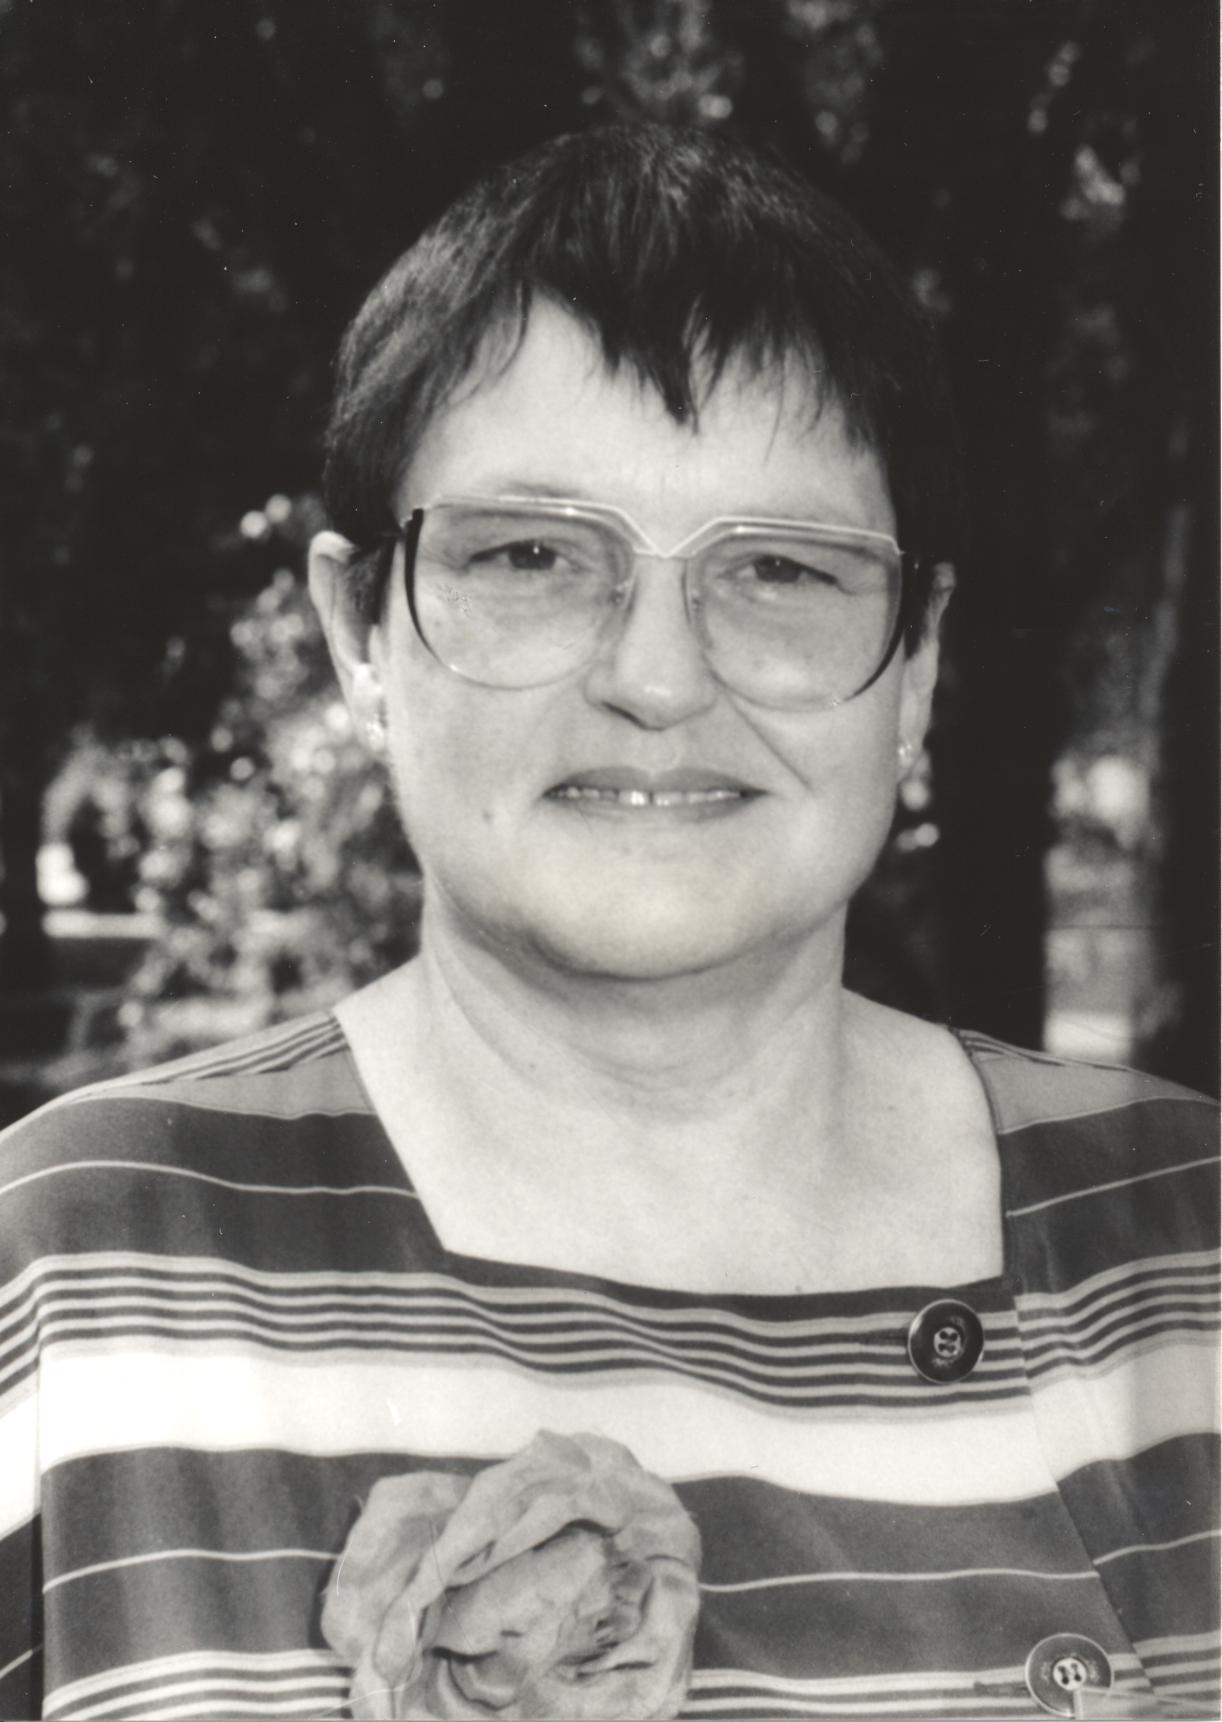 XIV. Imago Mundi-Kongress 1993, Innsbruck, Dr. Siglinde Dietz